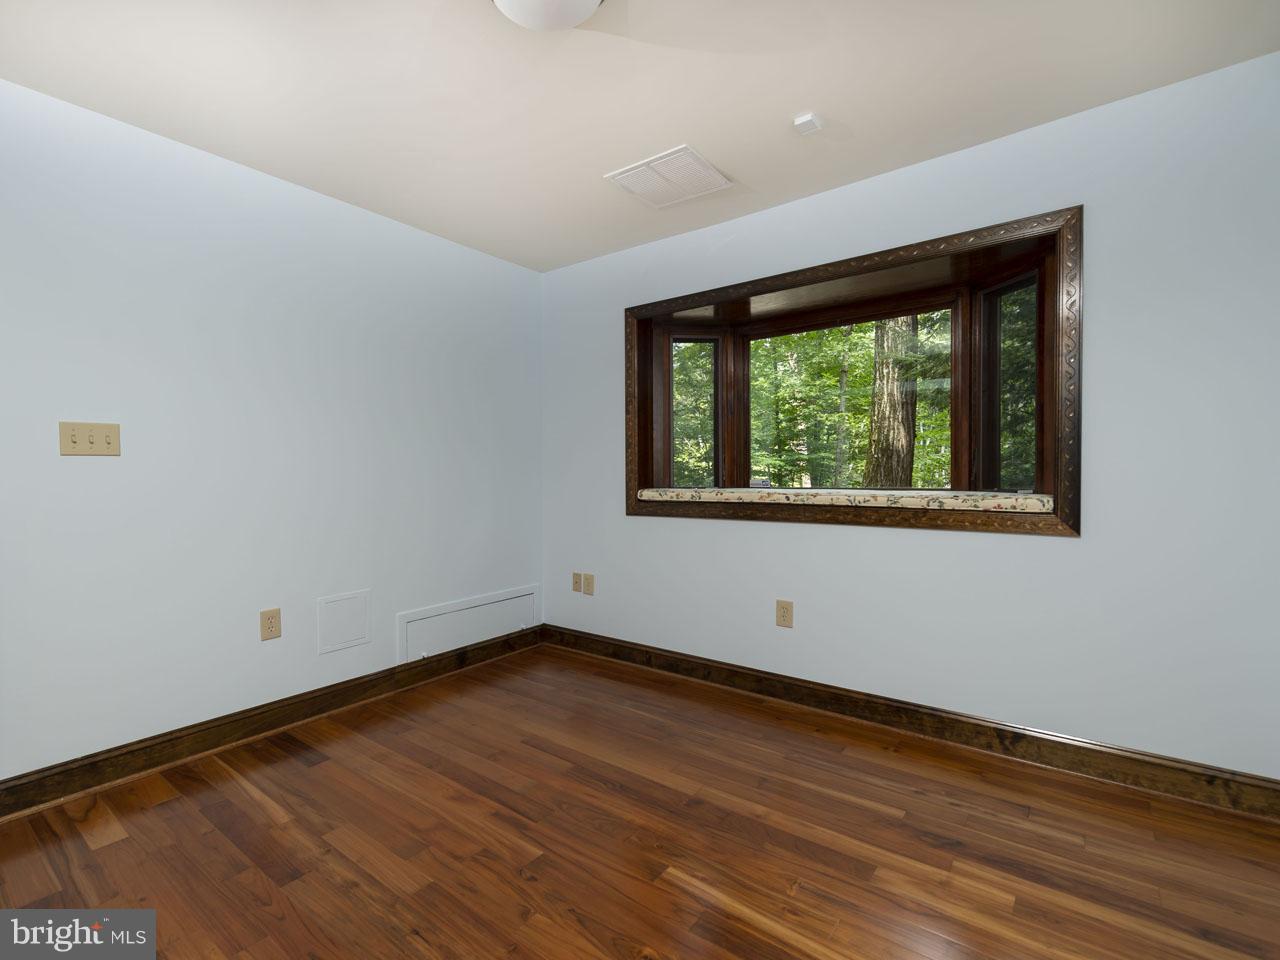 1002303700-300502417922-2021-07-22-03-27-23  |   | Alexandria Delaware Real Estate For Sale | MLS# 1002303700  - Best of Northern Virginia